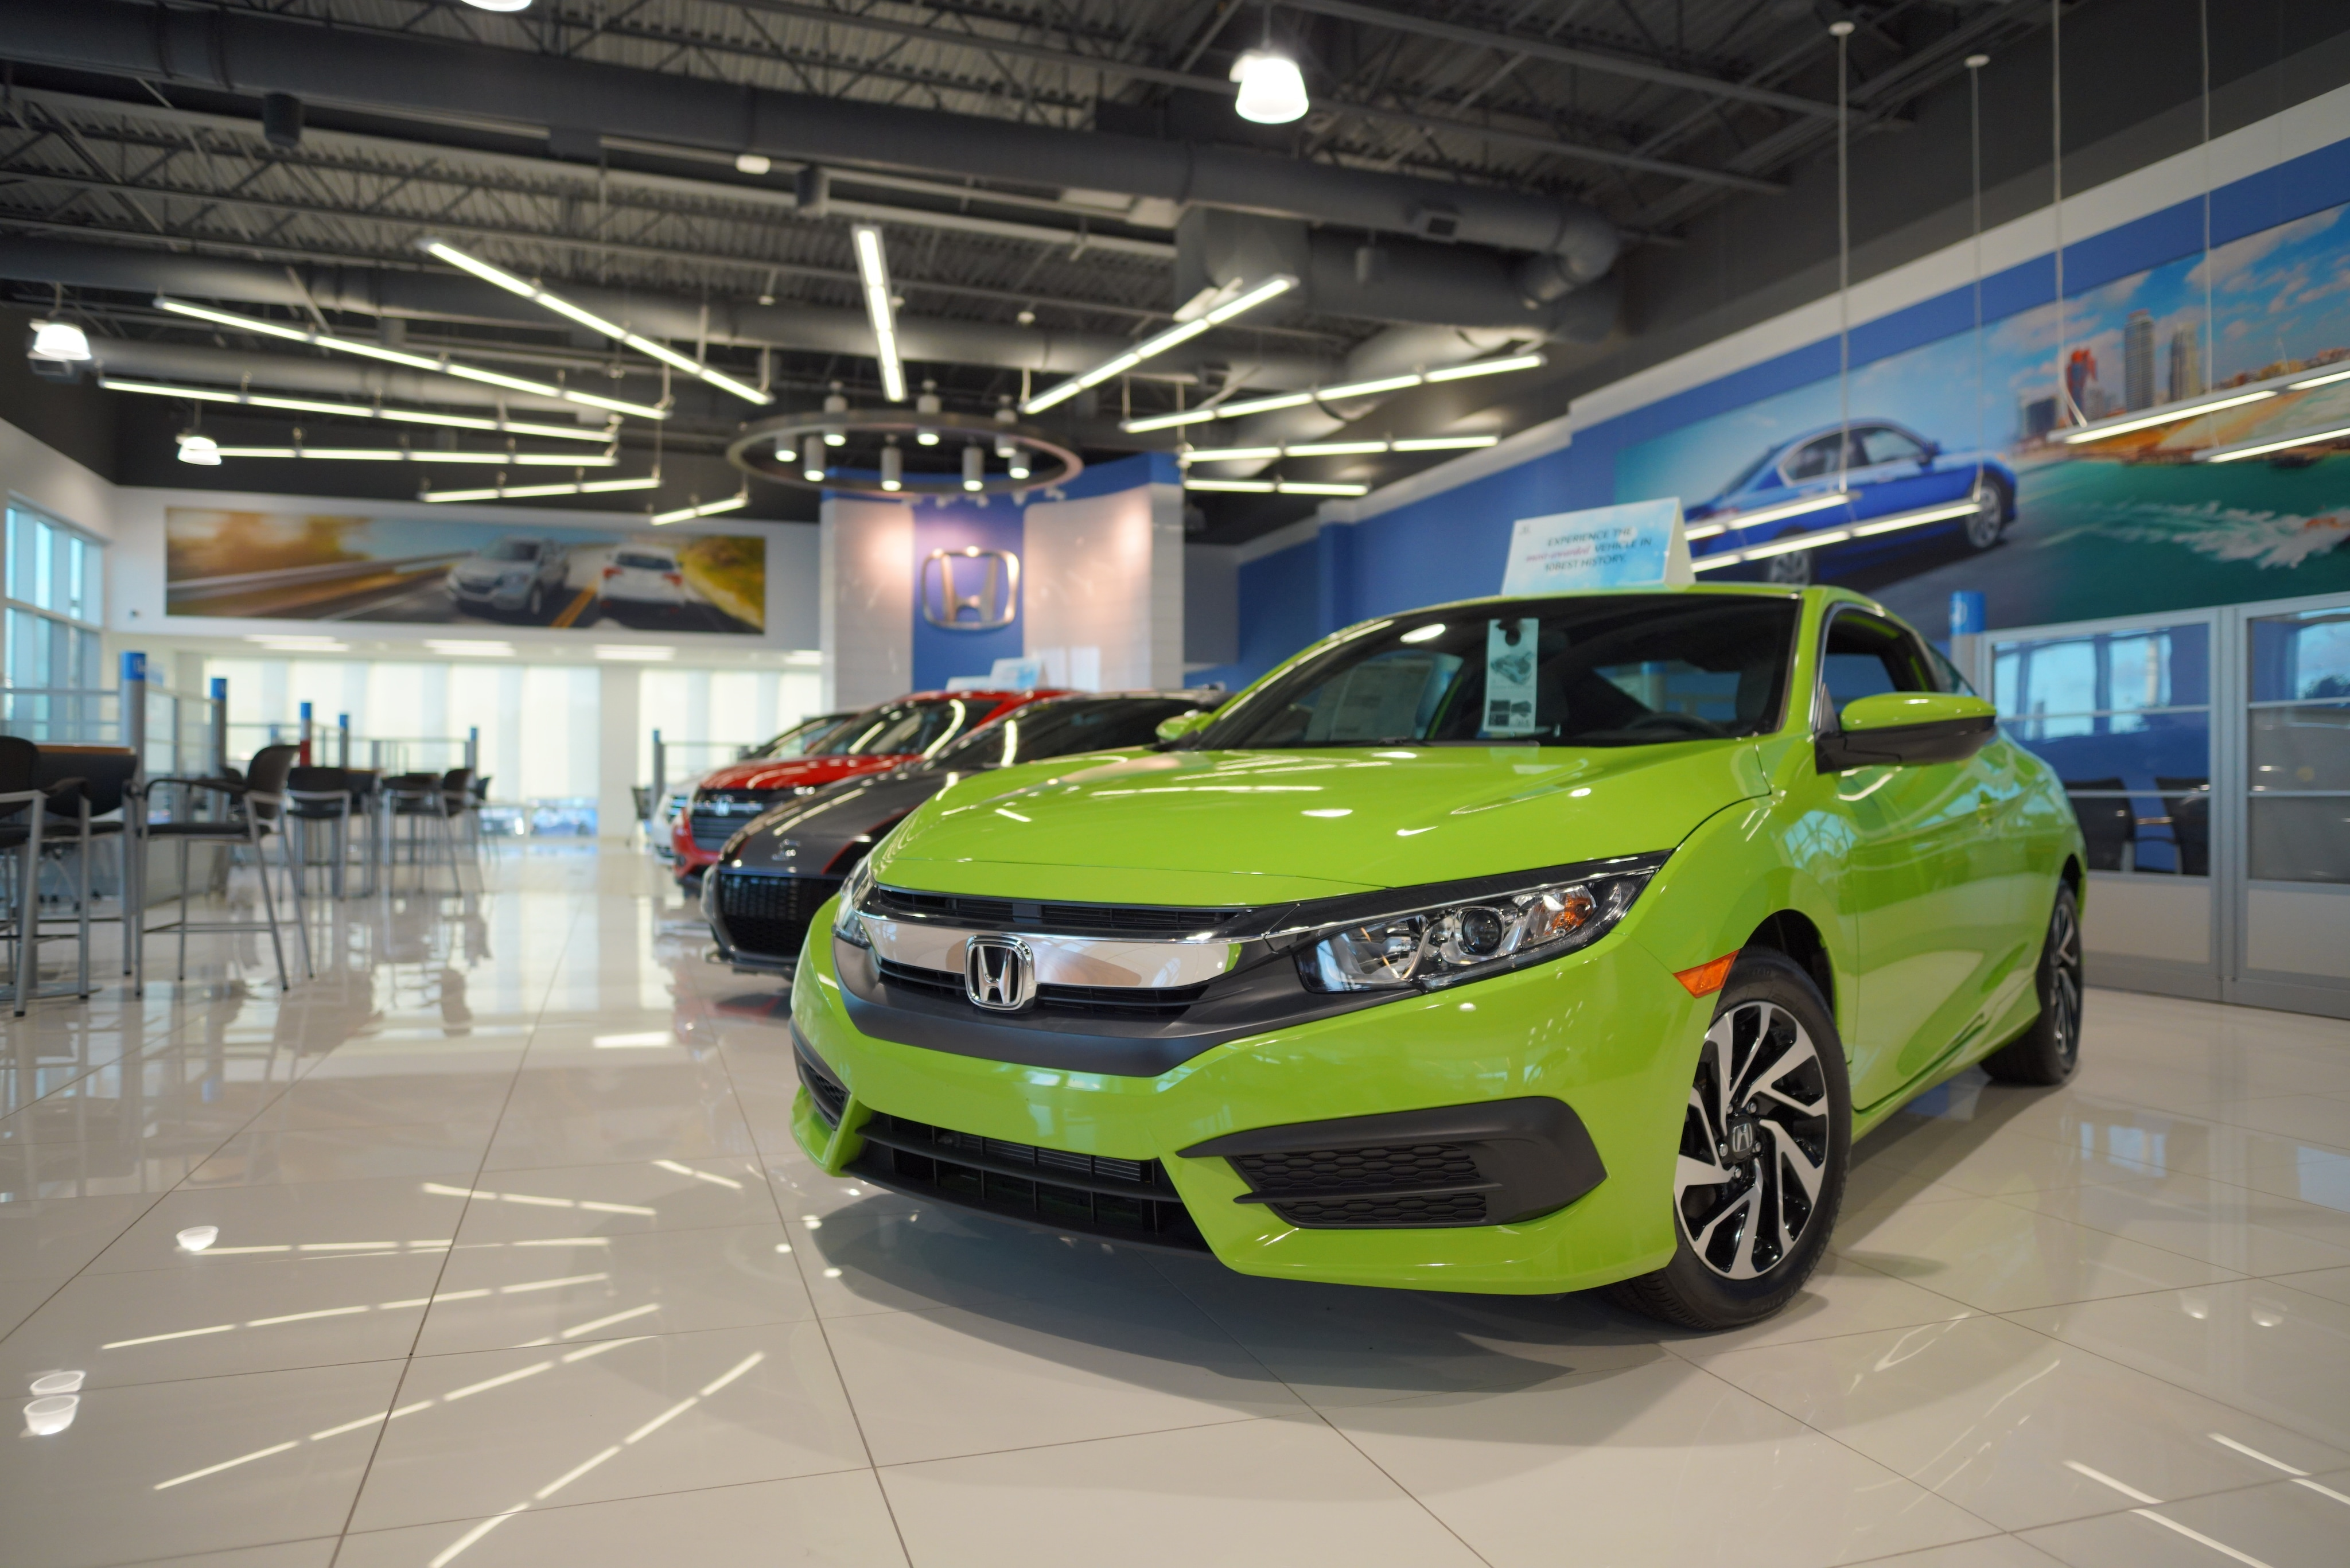 About AutoNation Honda Hollywood